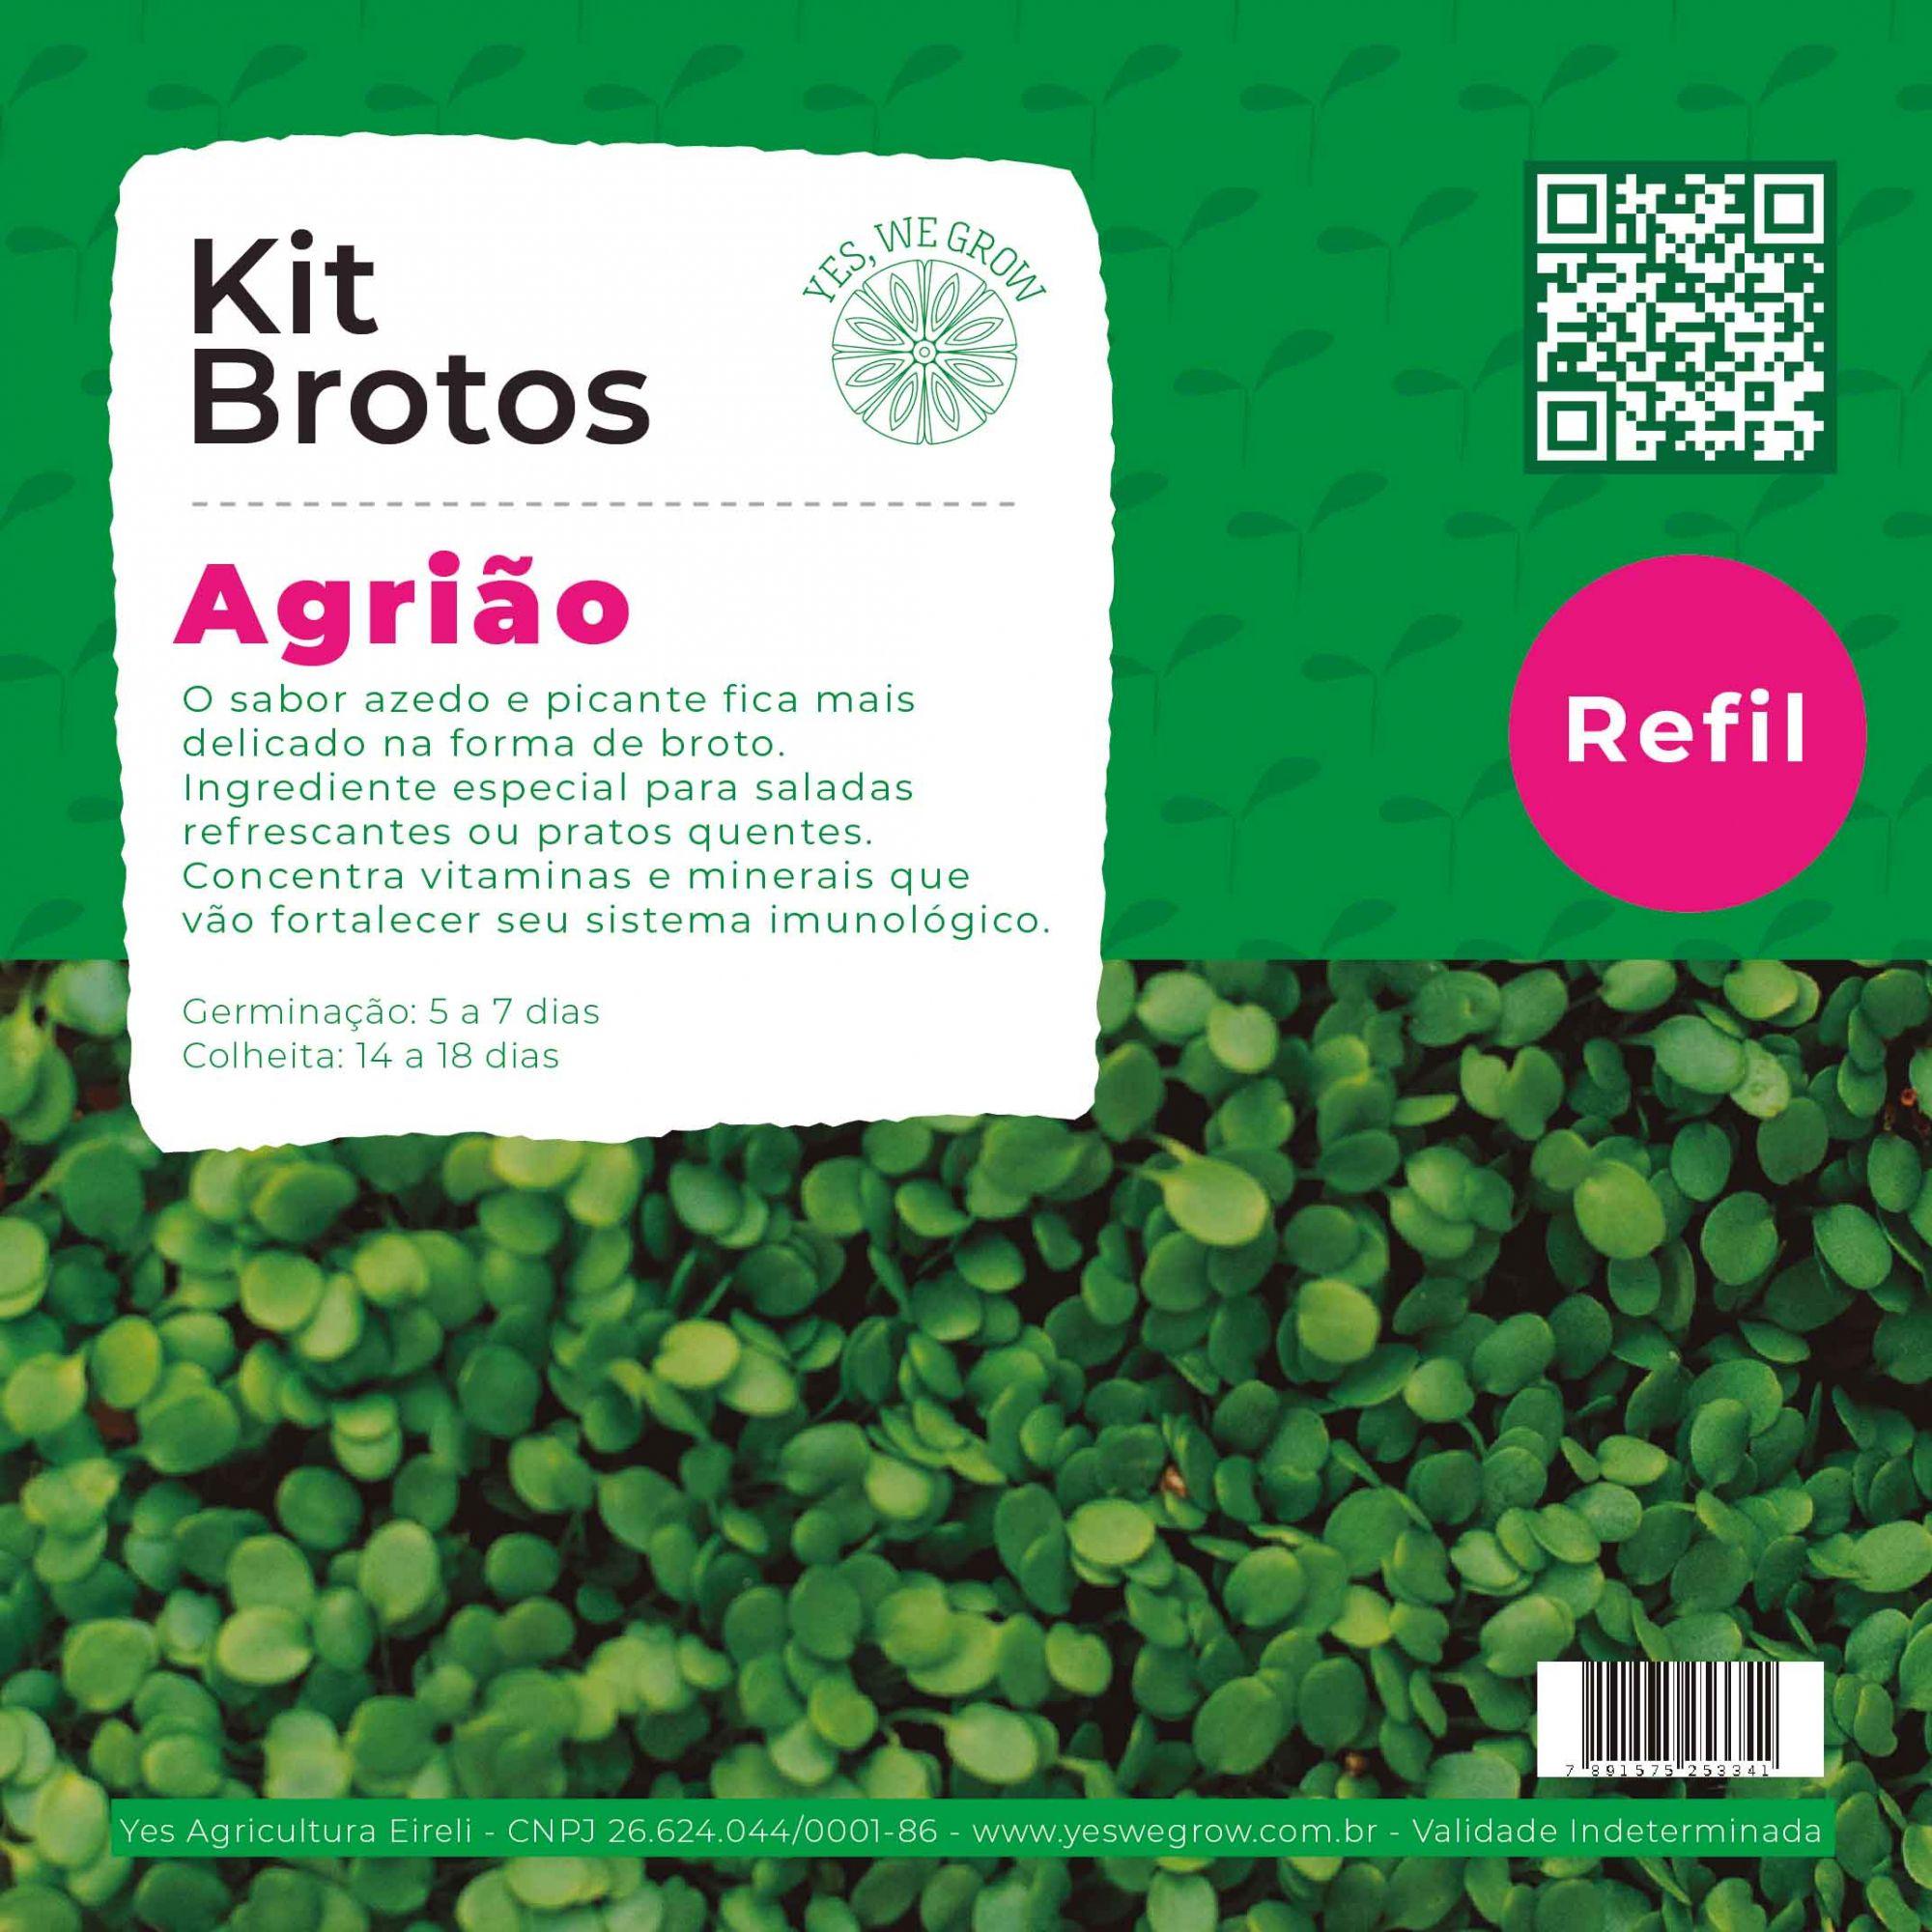 Refil para Kit Brotos Agrião